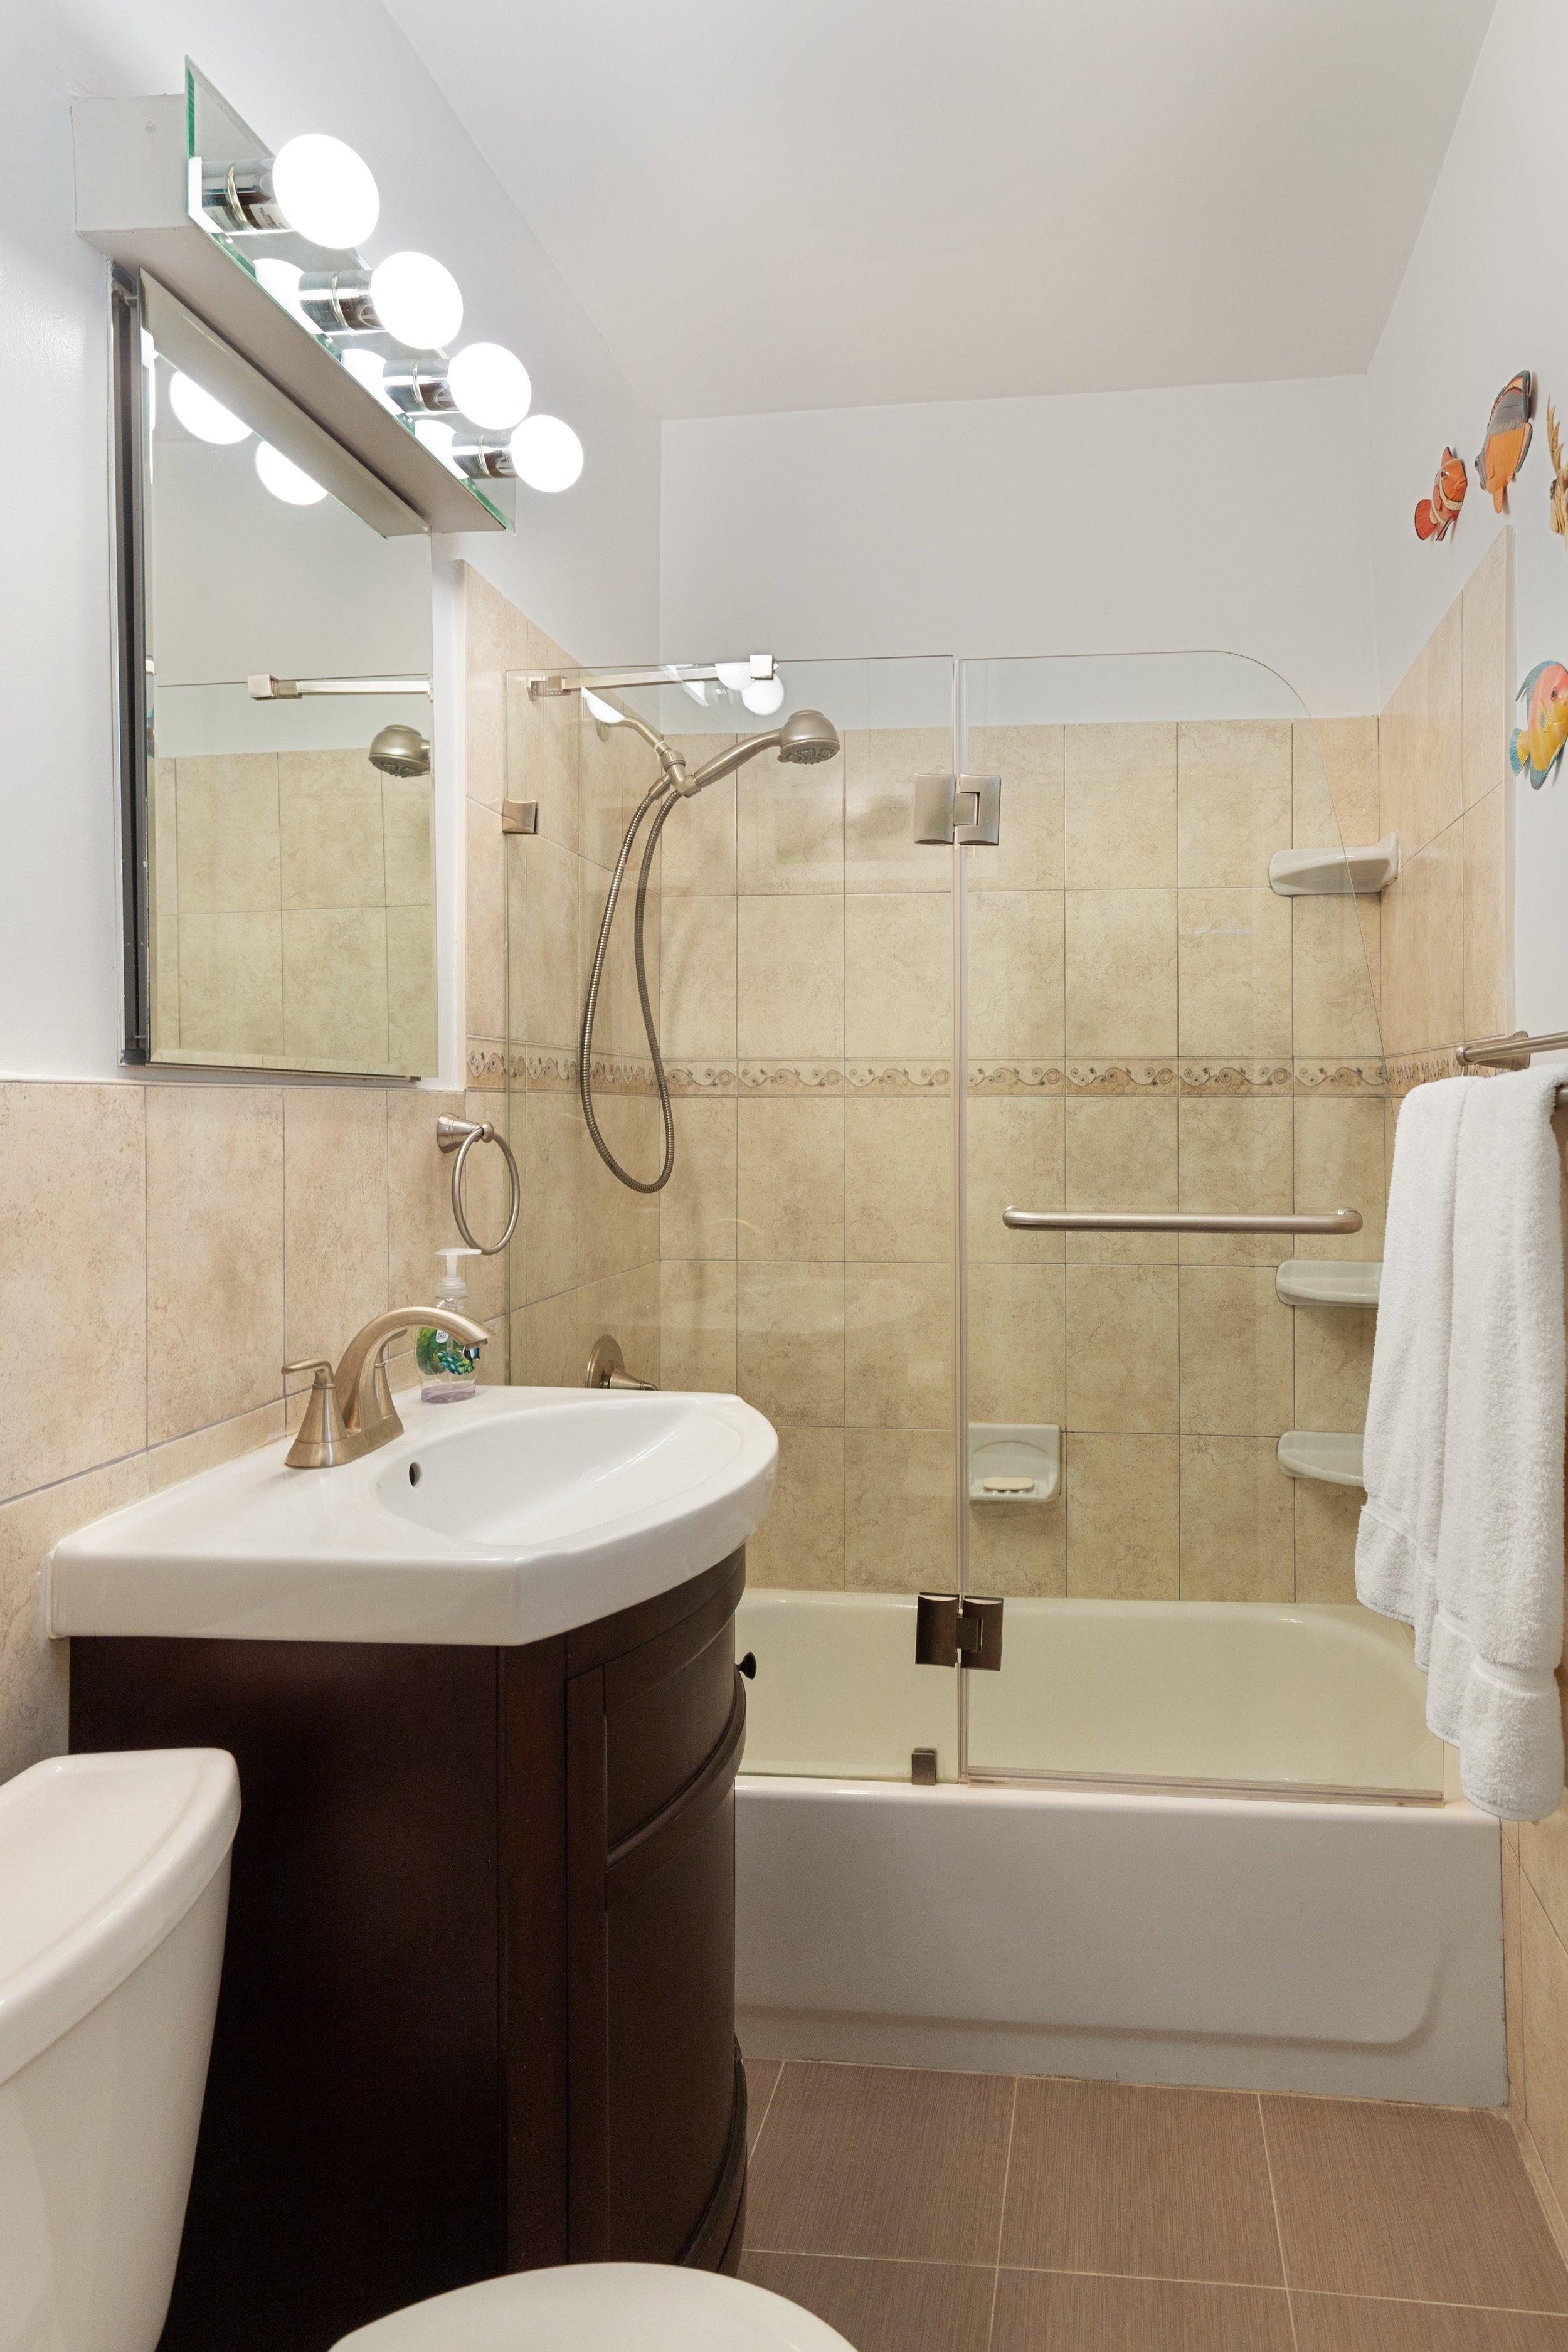 6_87HicksStreet_2D_8_Bathroom_HiRes.jpg